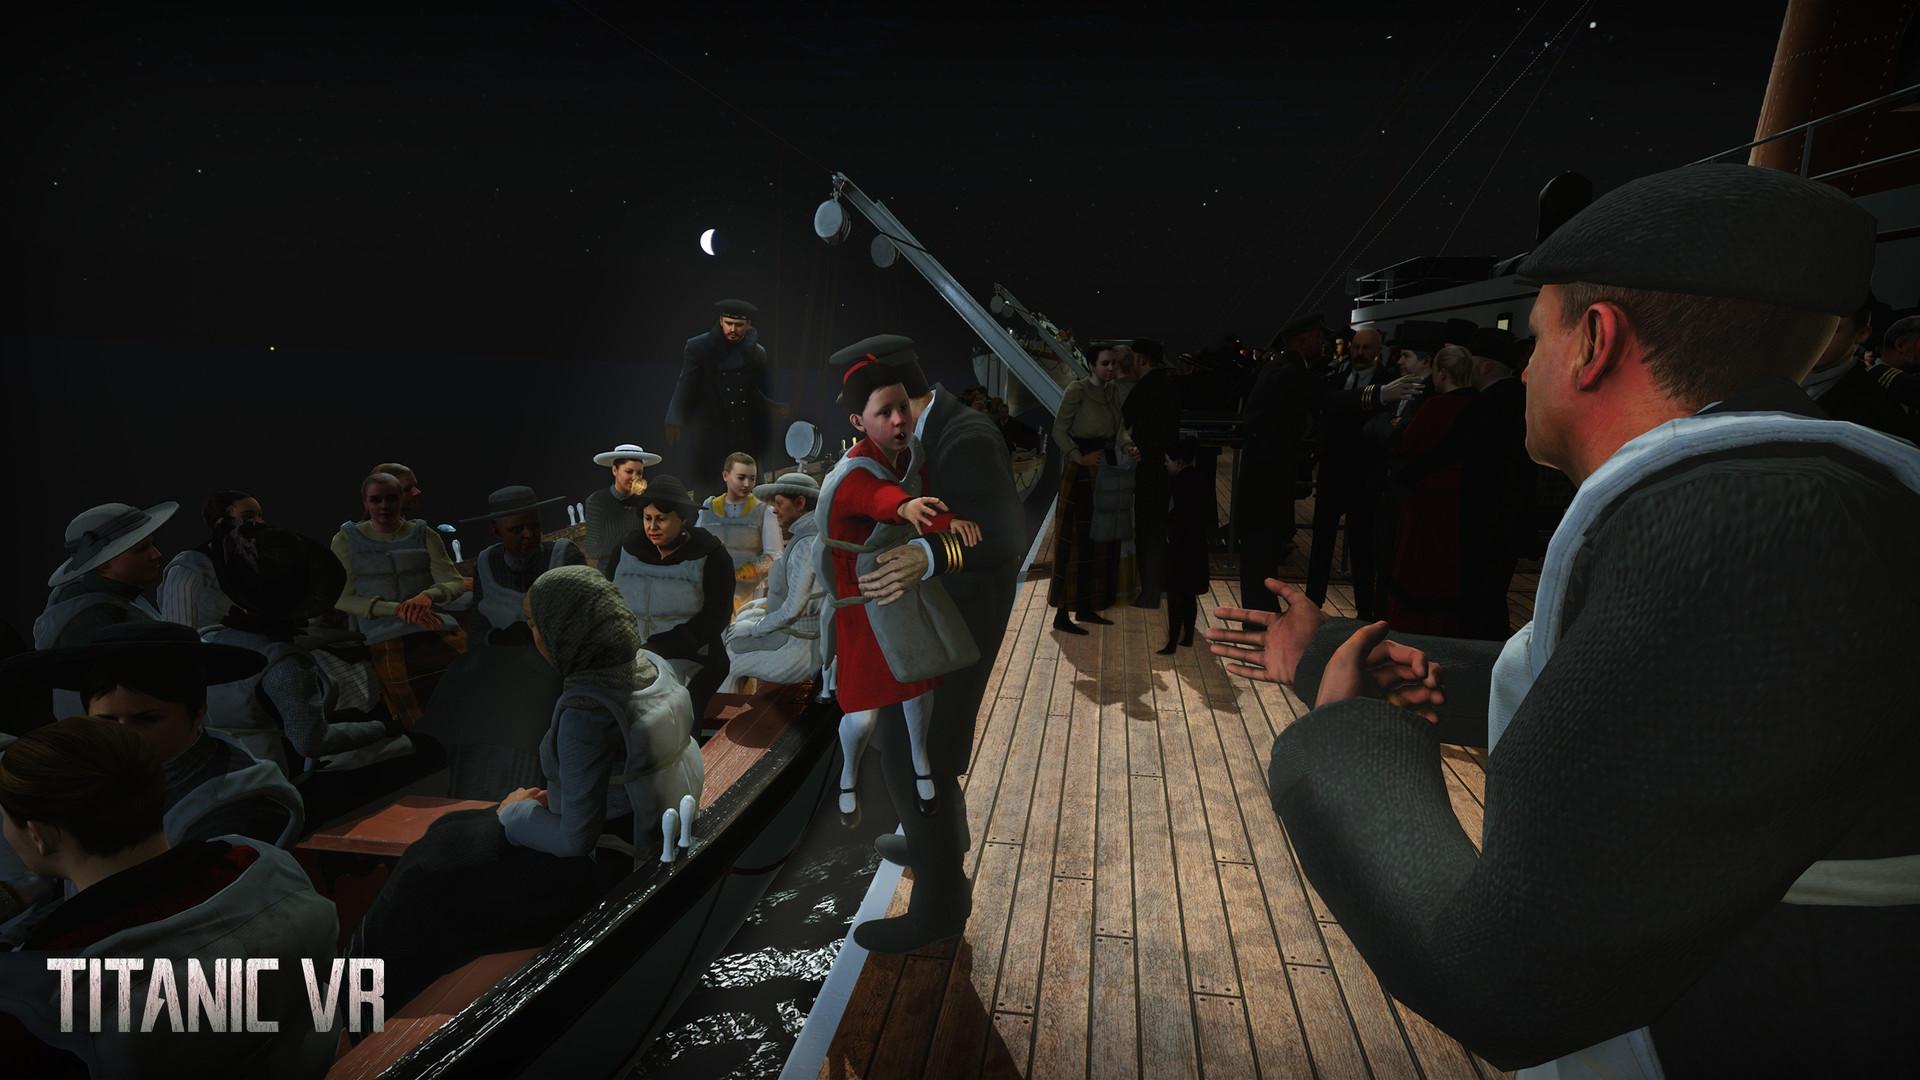 titanicvr1.jpg